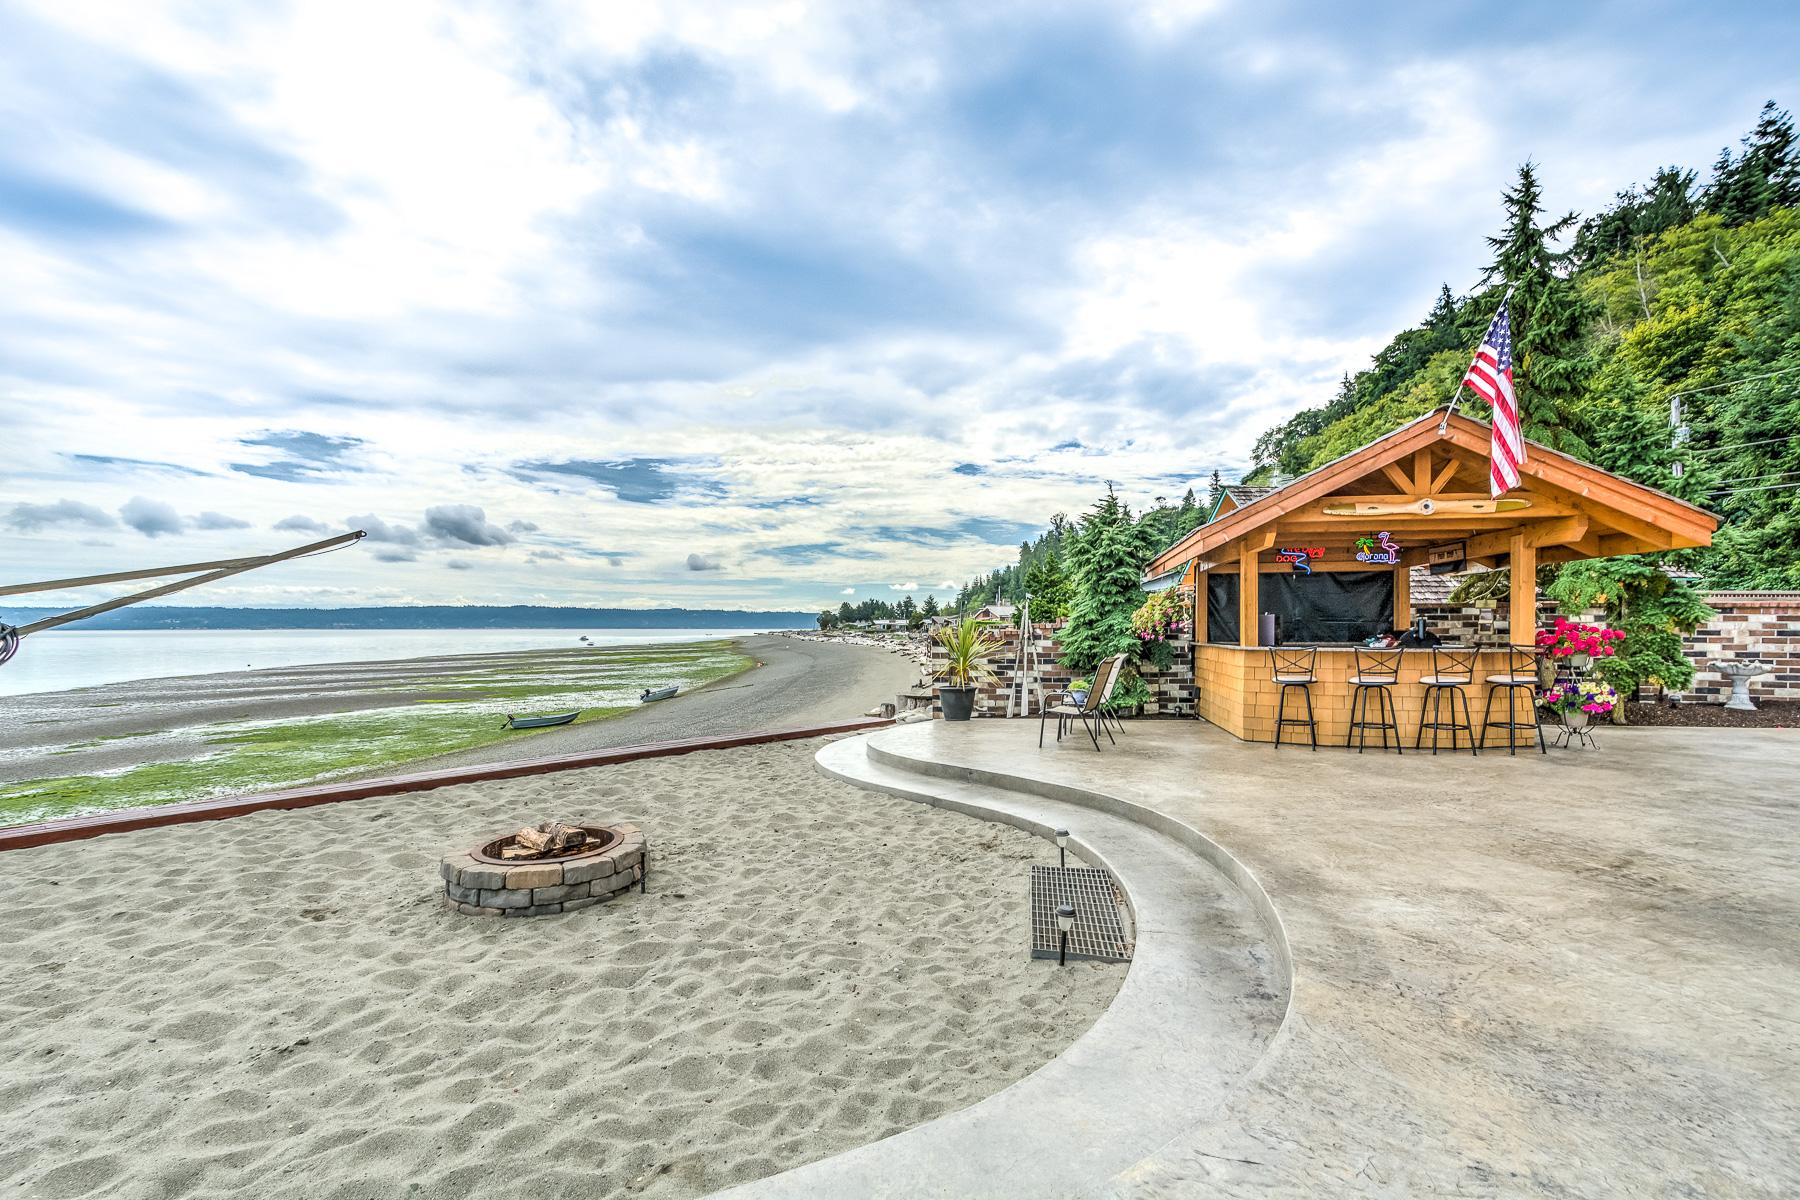 809 Port Susan Terrace Rd HDR Camano Island-33-1800x1200 sRGB.jpg